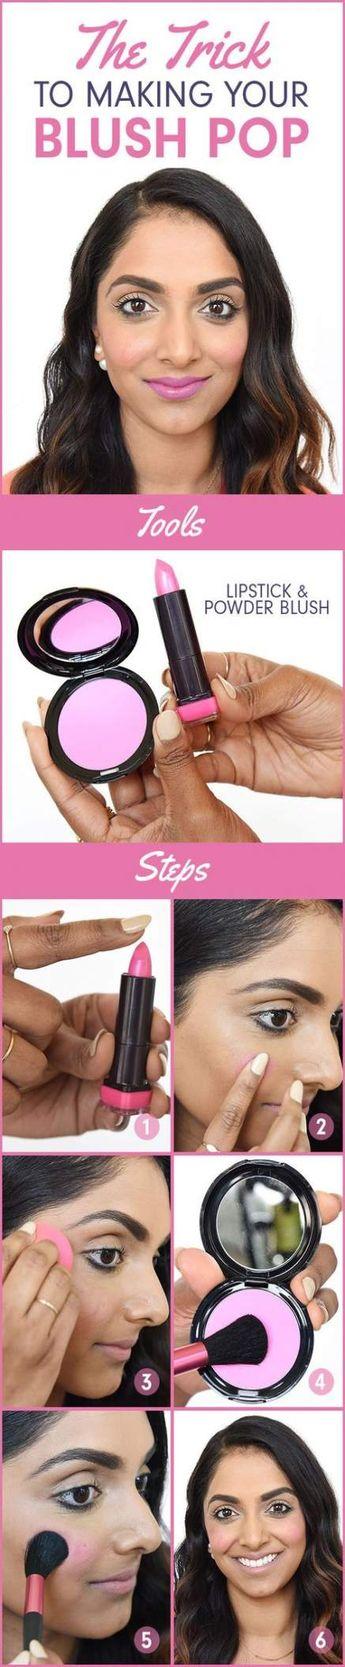 New makeup tips for dark circles red lipsticks 68 ideas #makeup